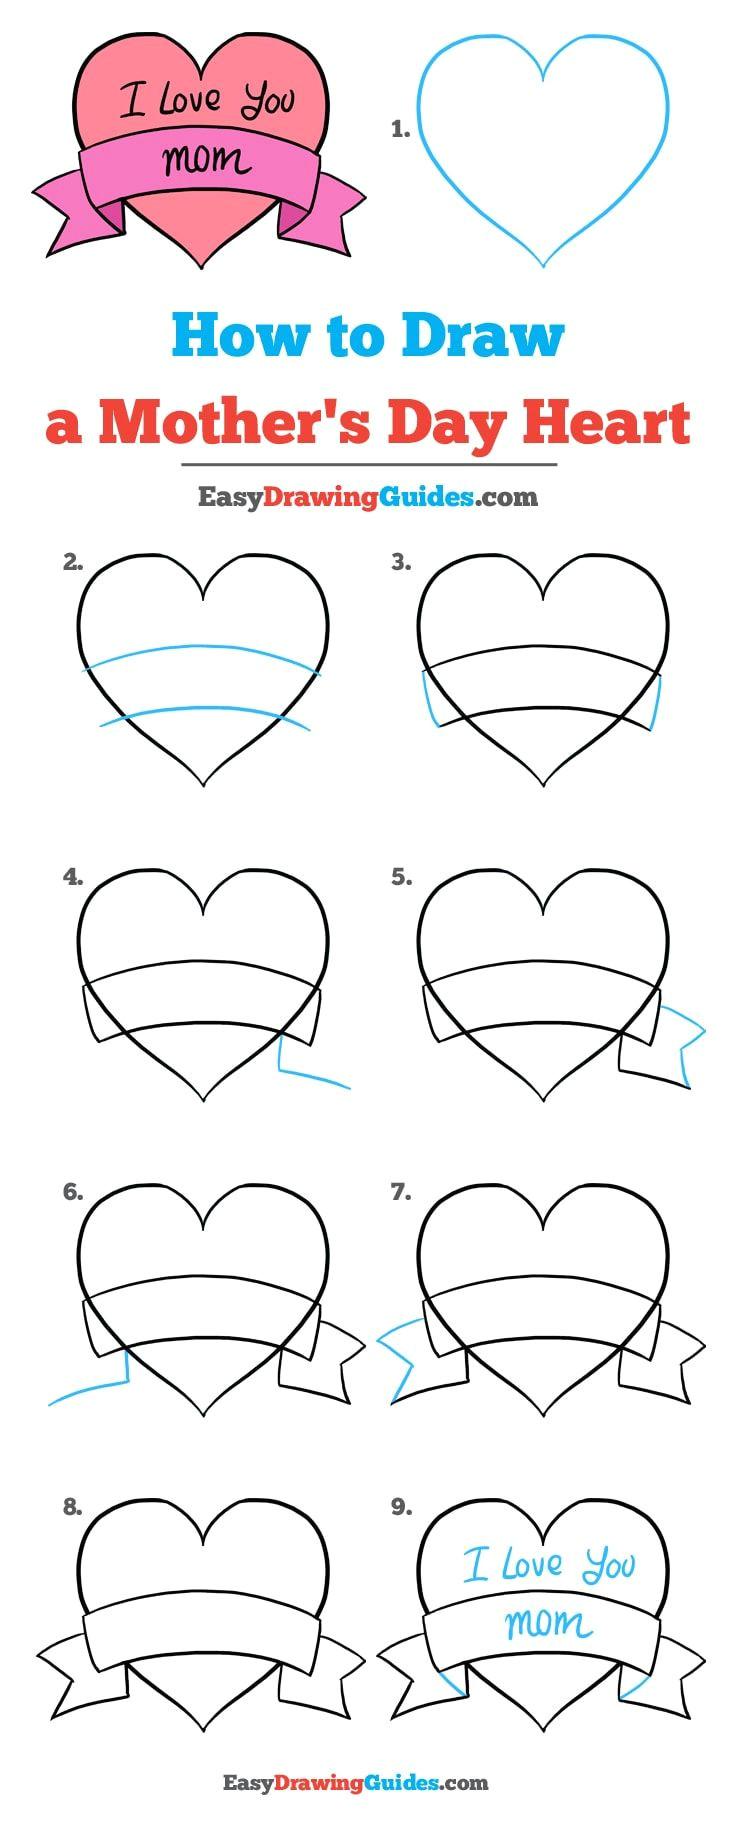 how to draw a mother s day heart really easy drawing tutorial dibujos pinterest ca mo dibujar aprender a dibujar and dibujar arte